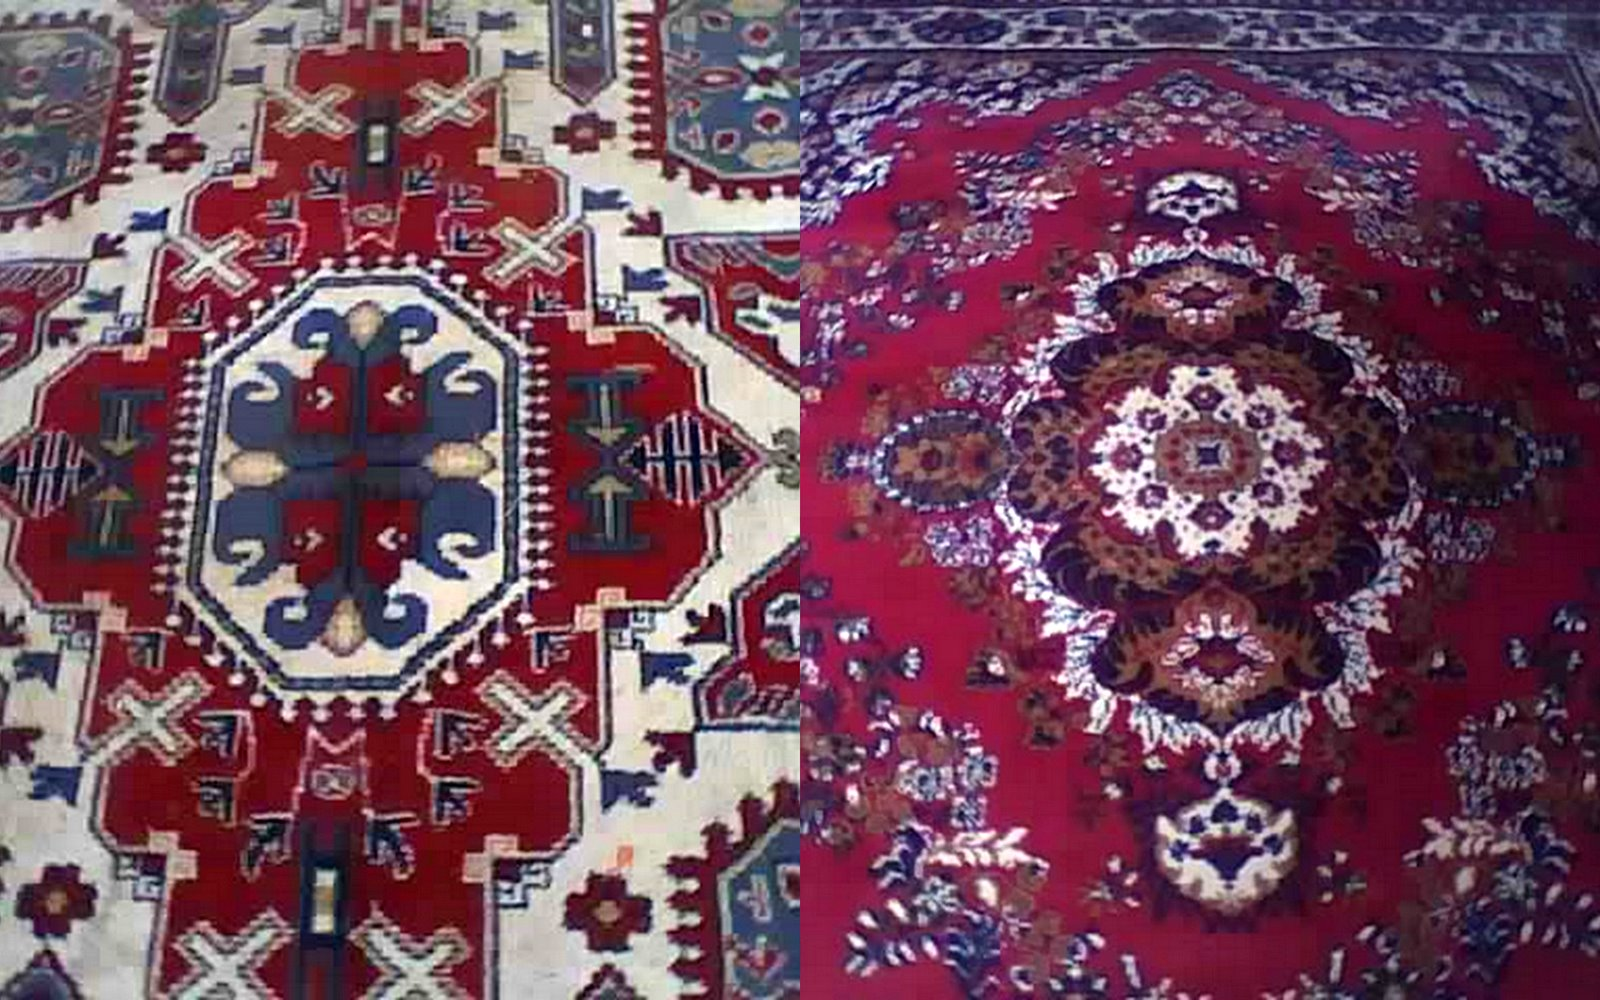 Antiguedades en cordoba argentina antiguedades alfombras for Alfombras estilo persa